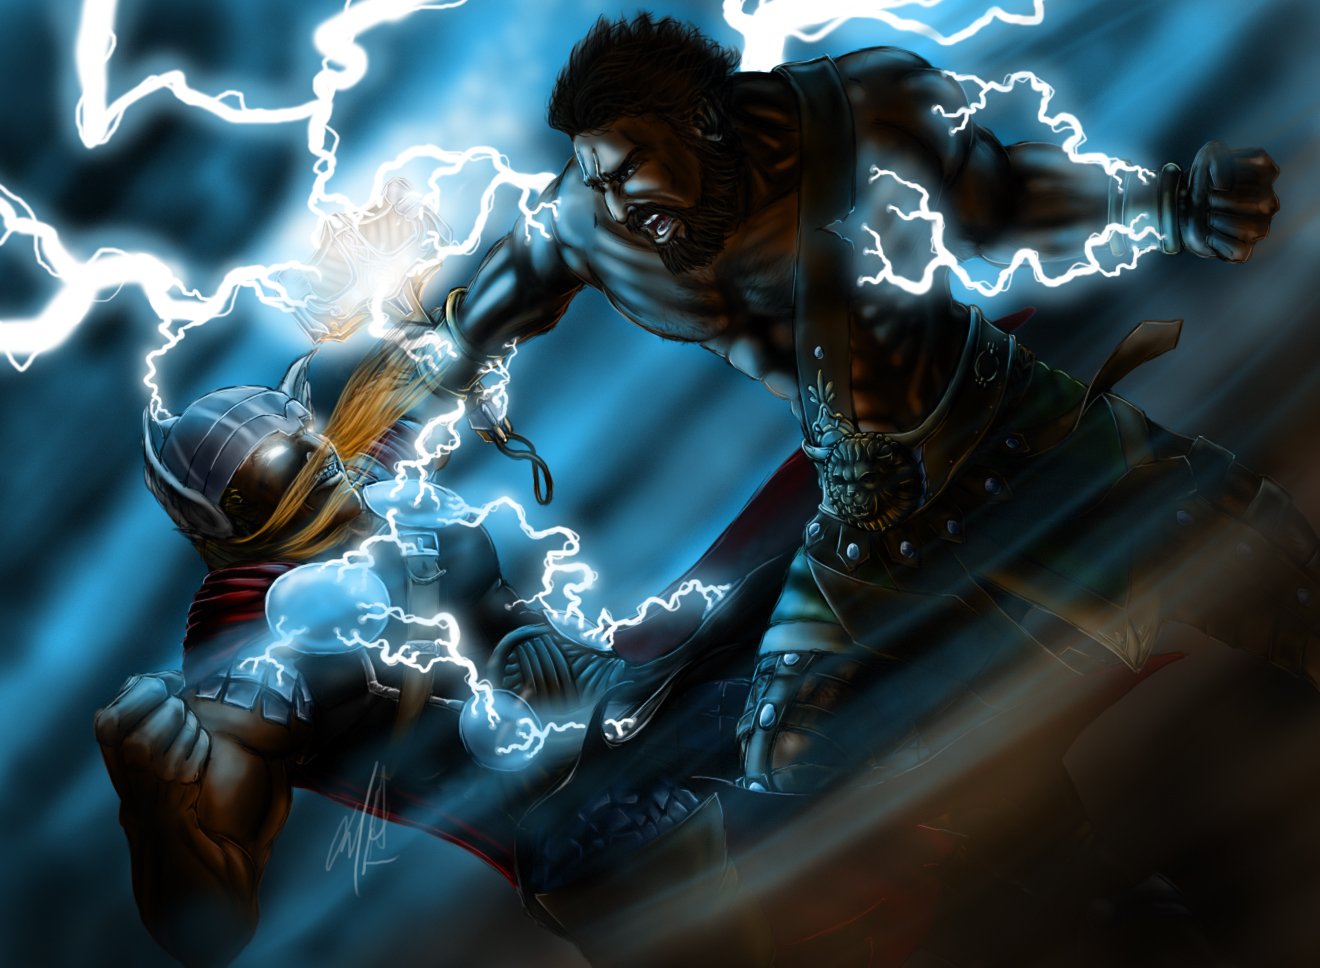 Thor Vs Hercules by Vatero